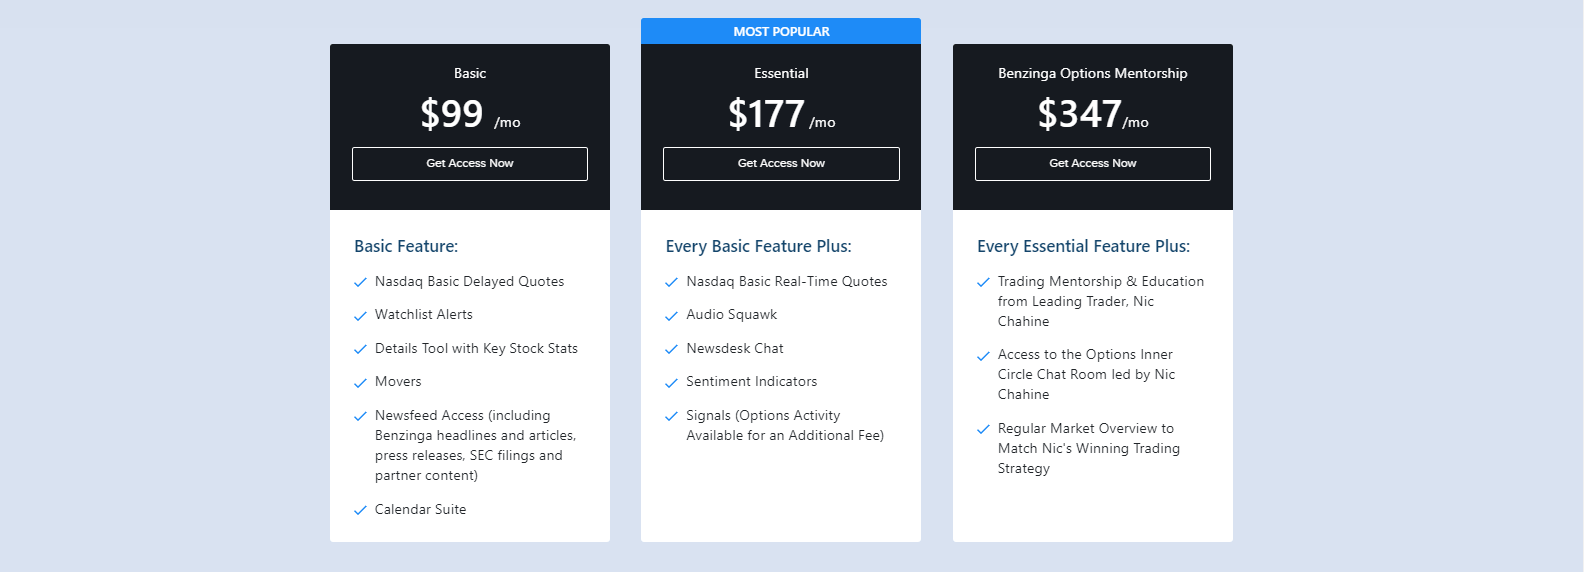 Benzinga Pricing